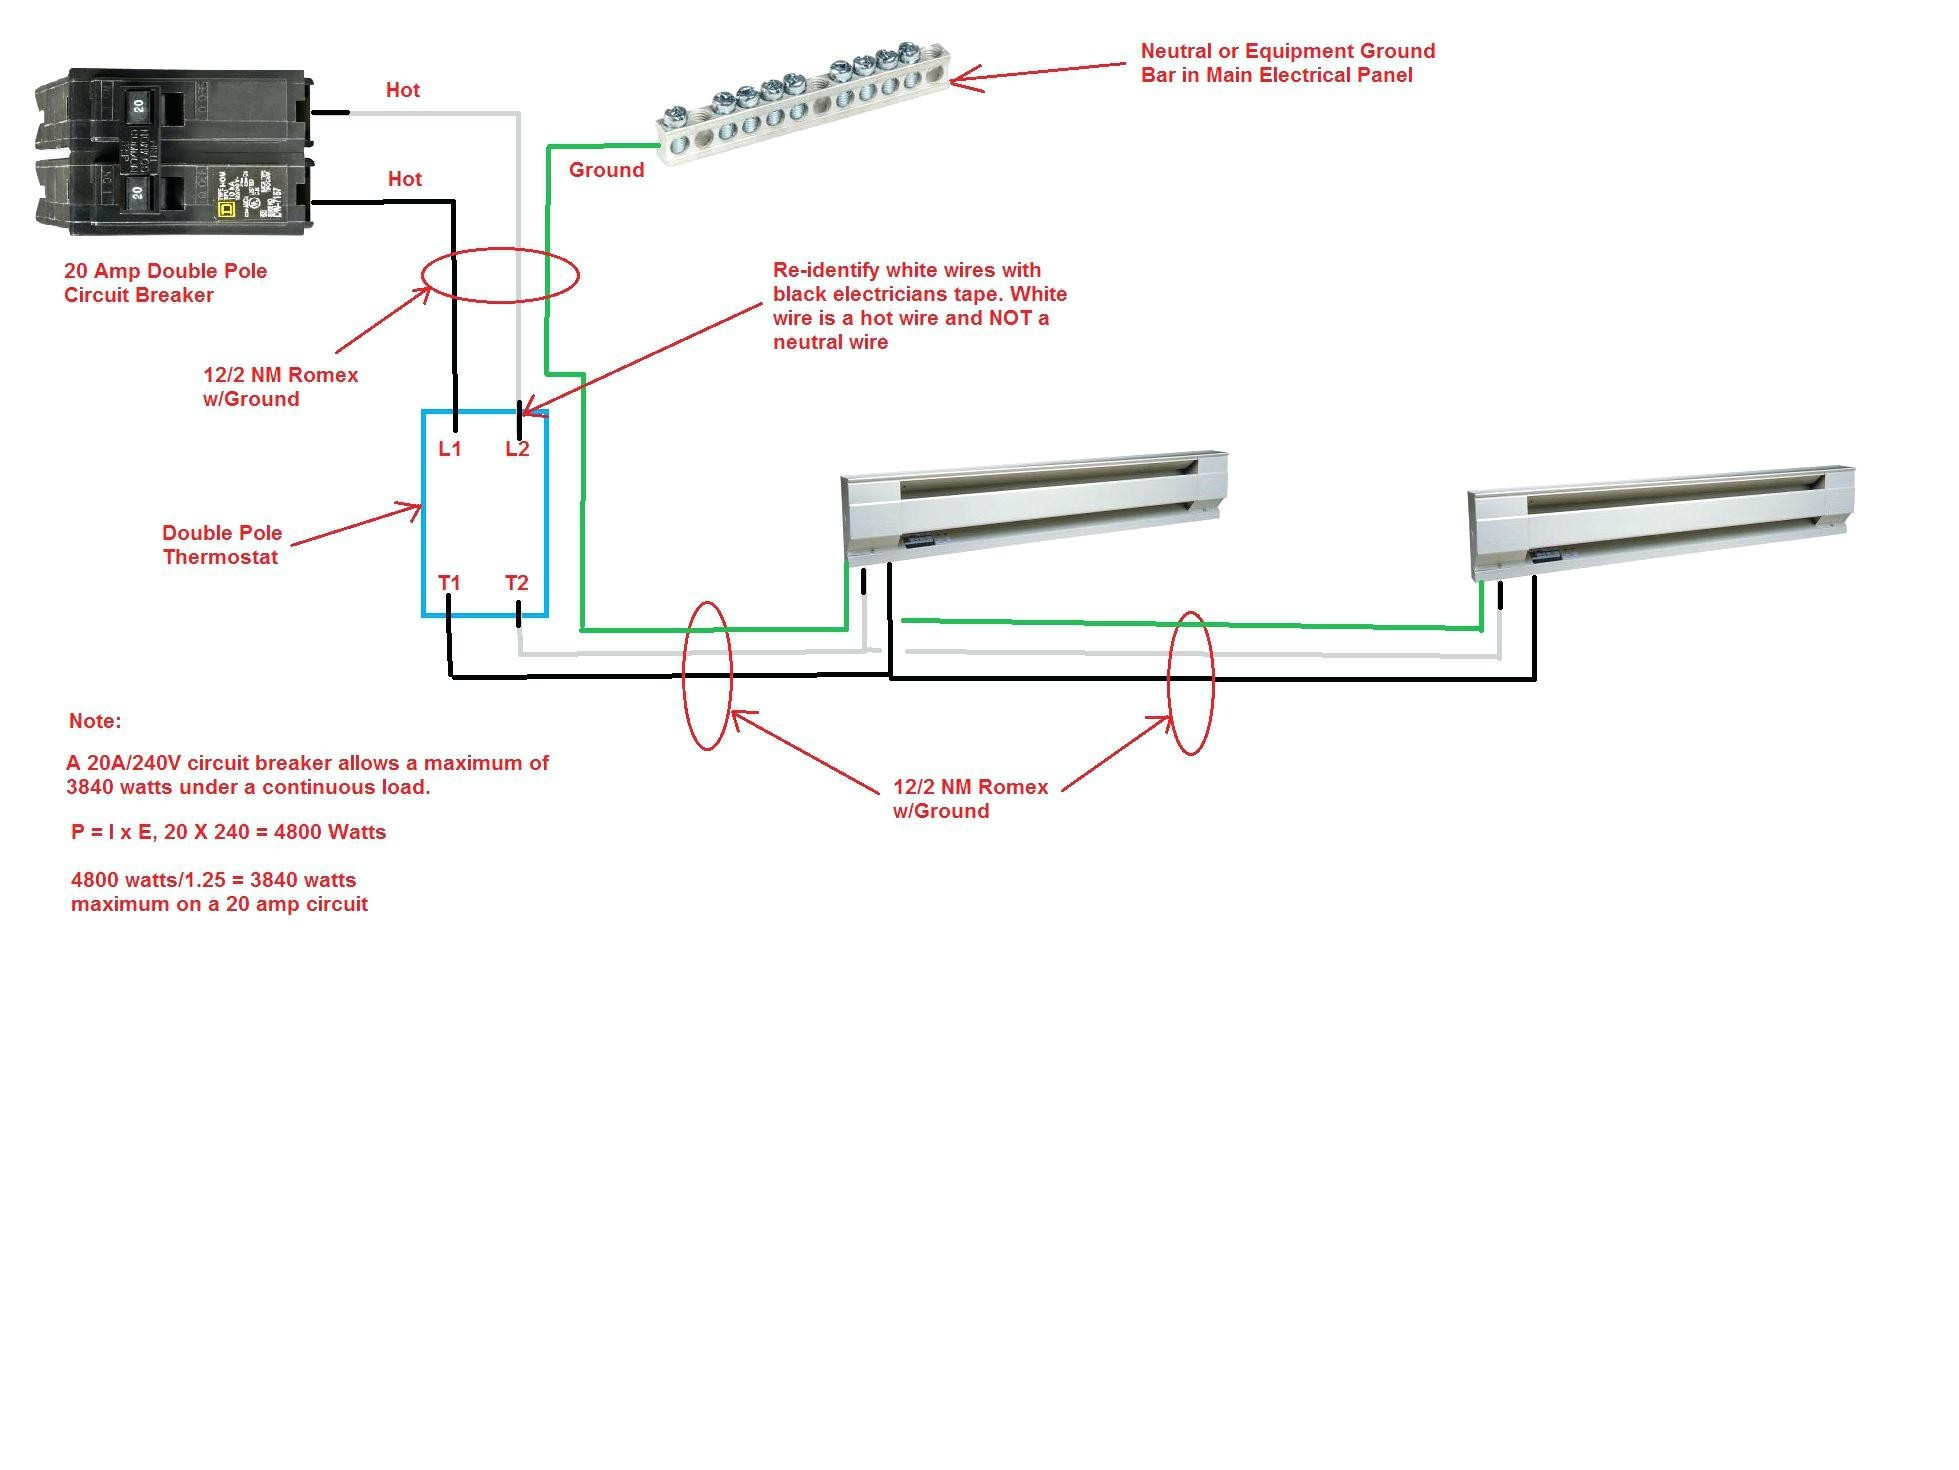 marley baseboard heater wiring diagram Download-Fahrenheat Baseboard Heater Wiring Diagram Valid Baseboard Heaters Wiring For Baseboard Fahrenheat Baseboard Heater Wiring Diagram 6-r